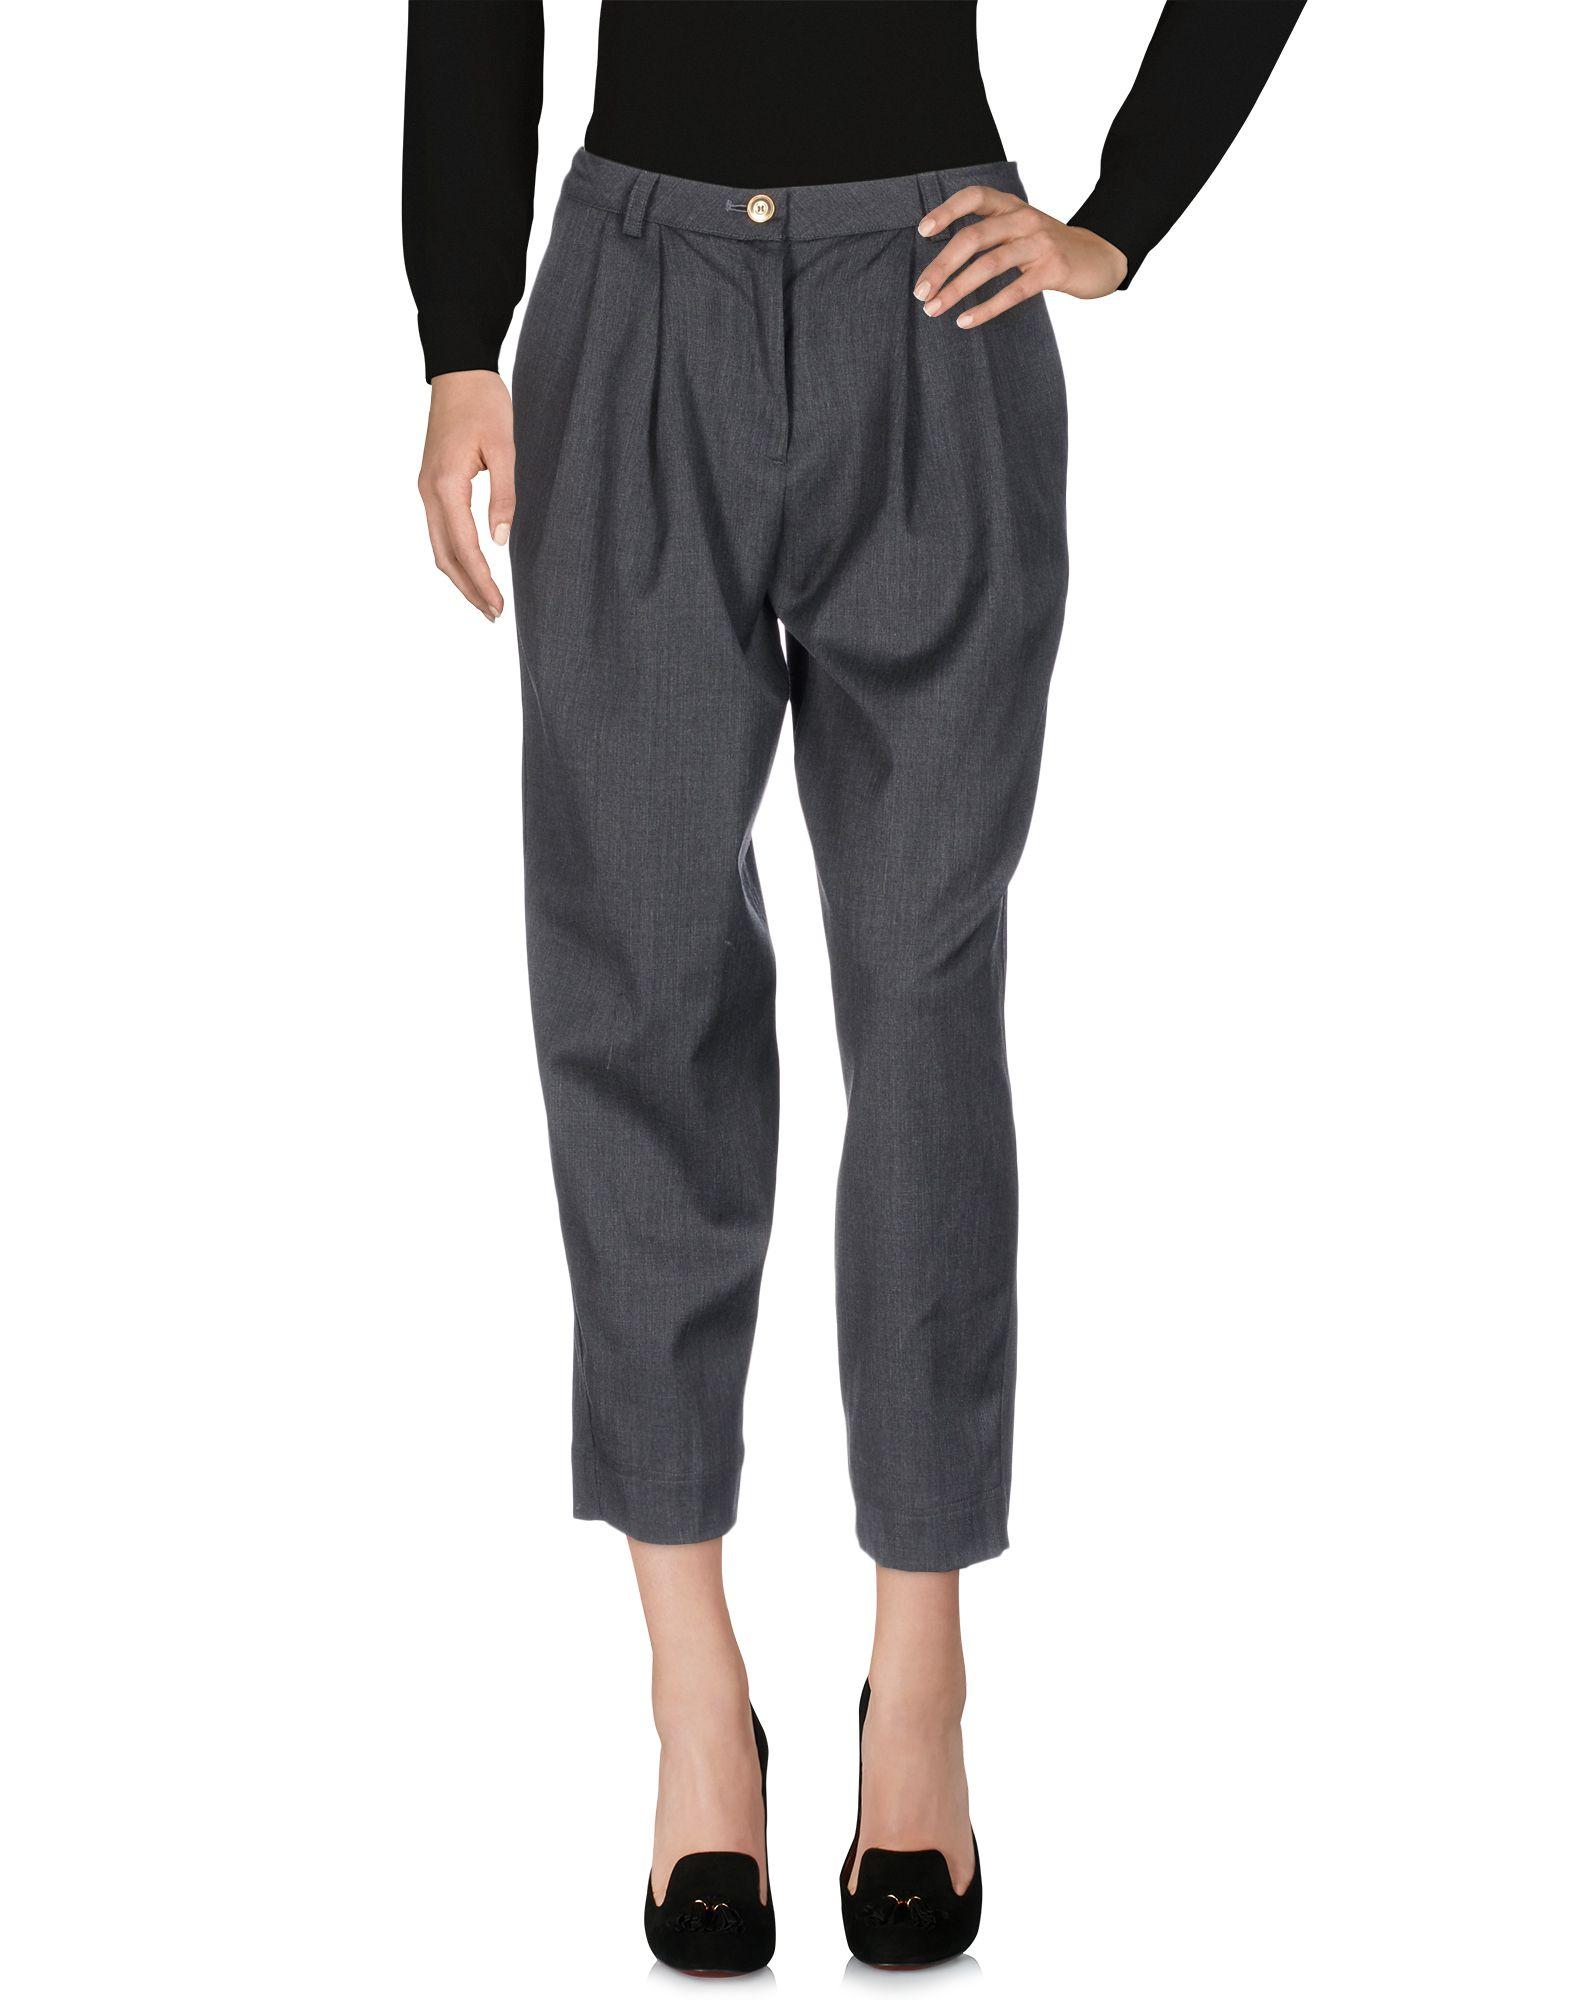 J.WON Casual Pants in Steel Grey